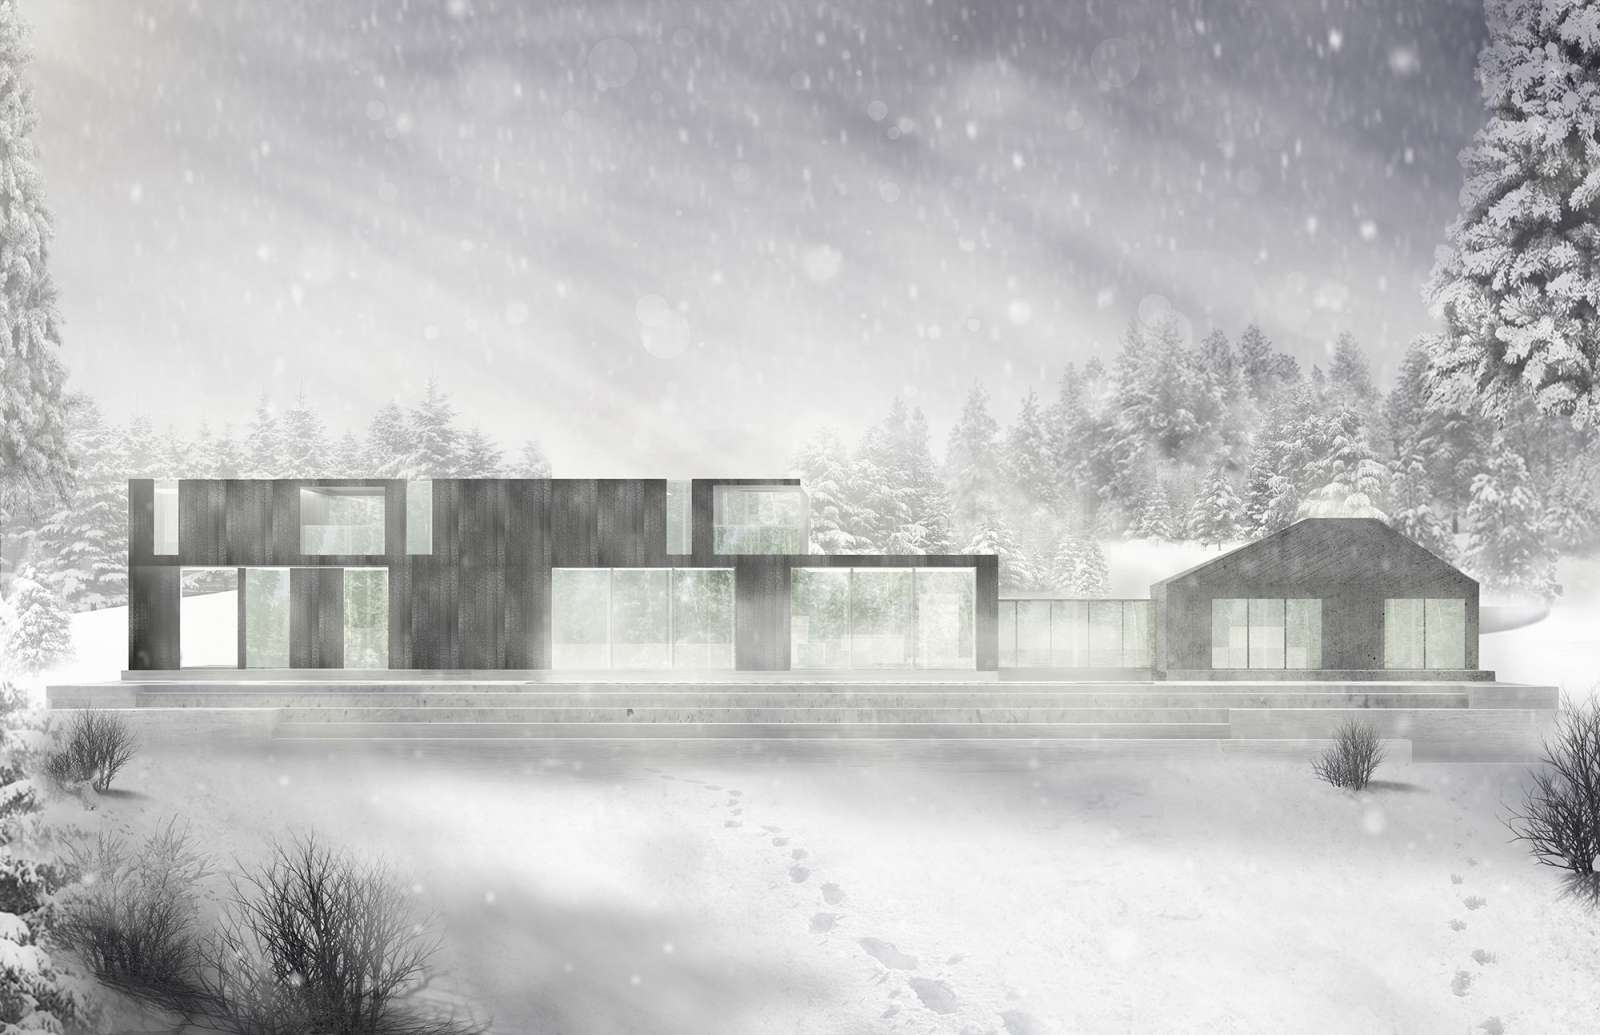 alexandra-loew-50shadesofblack-rendering-schemea-exterior-back-copy.jpg